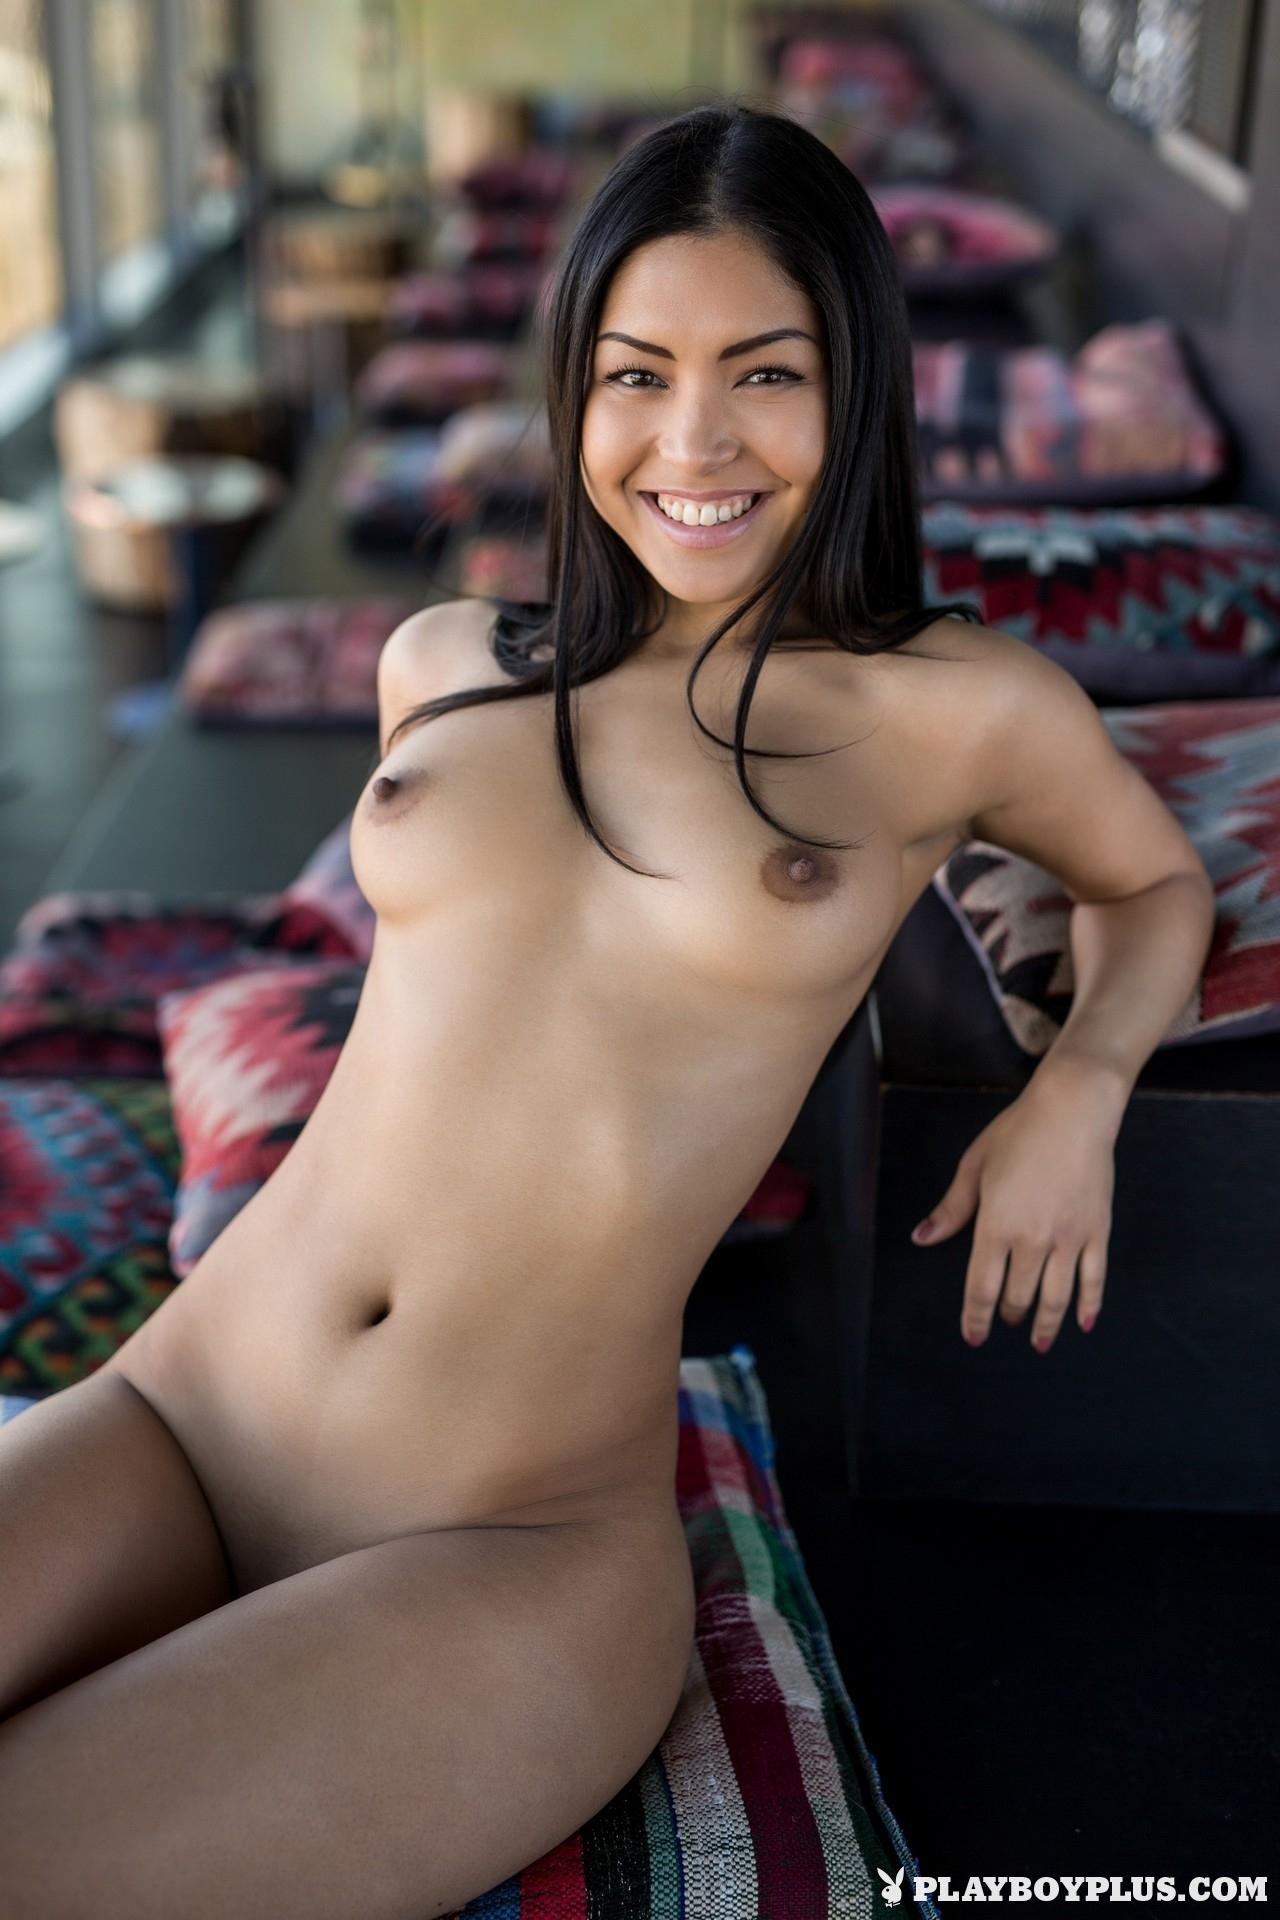 Playboy Plus Chloe Rose In Inspiring View (28)